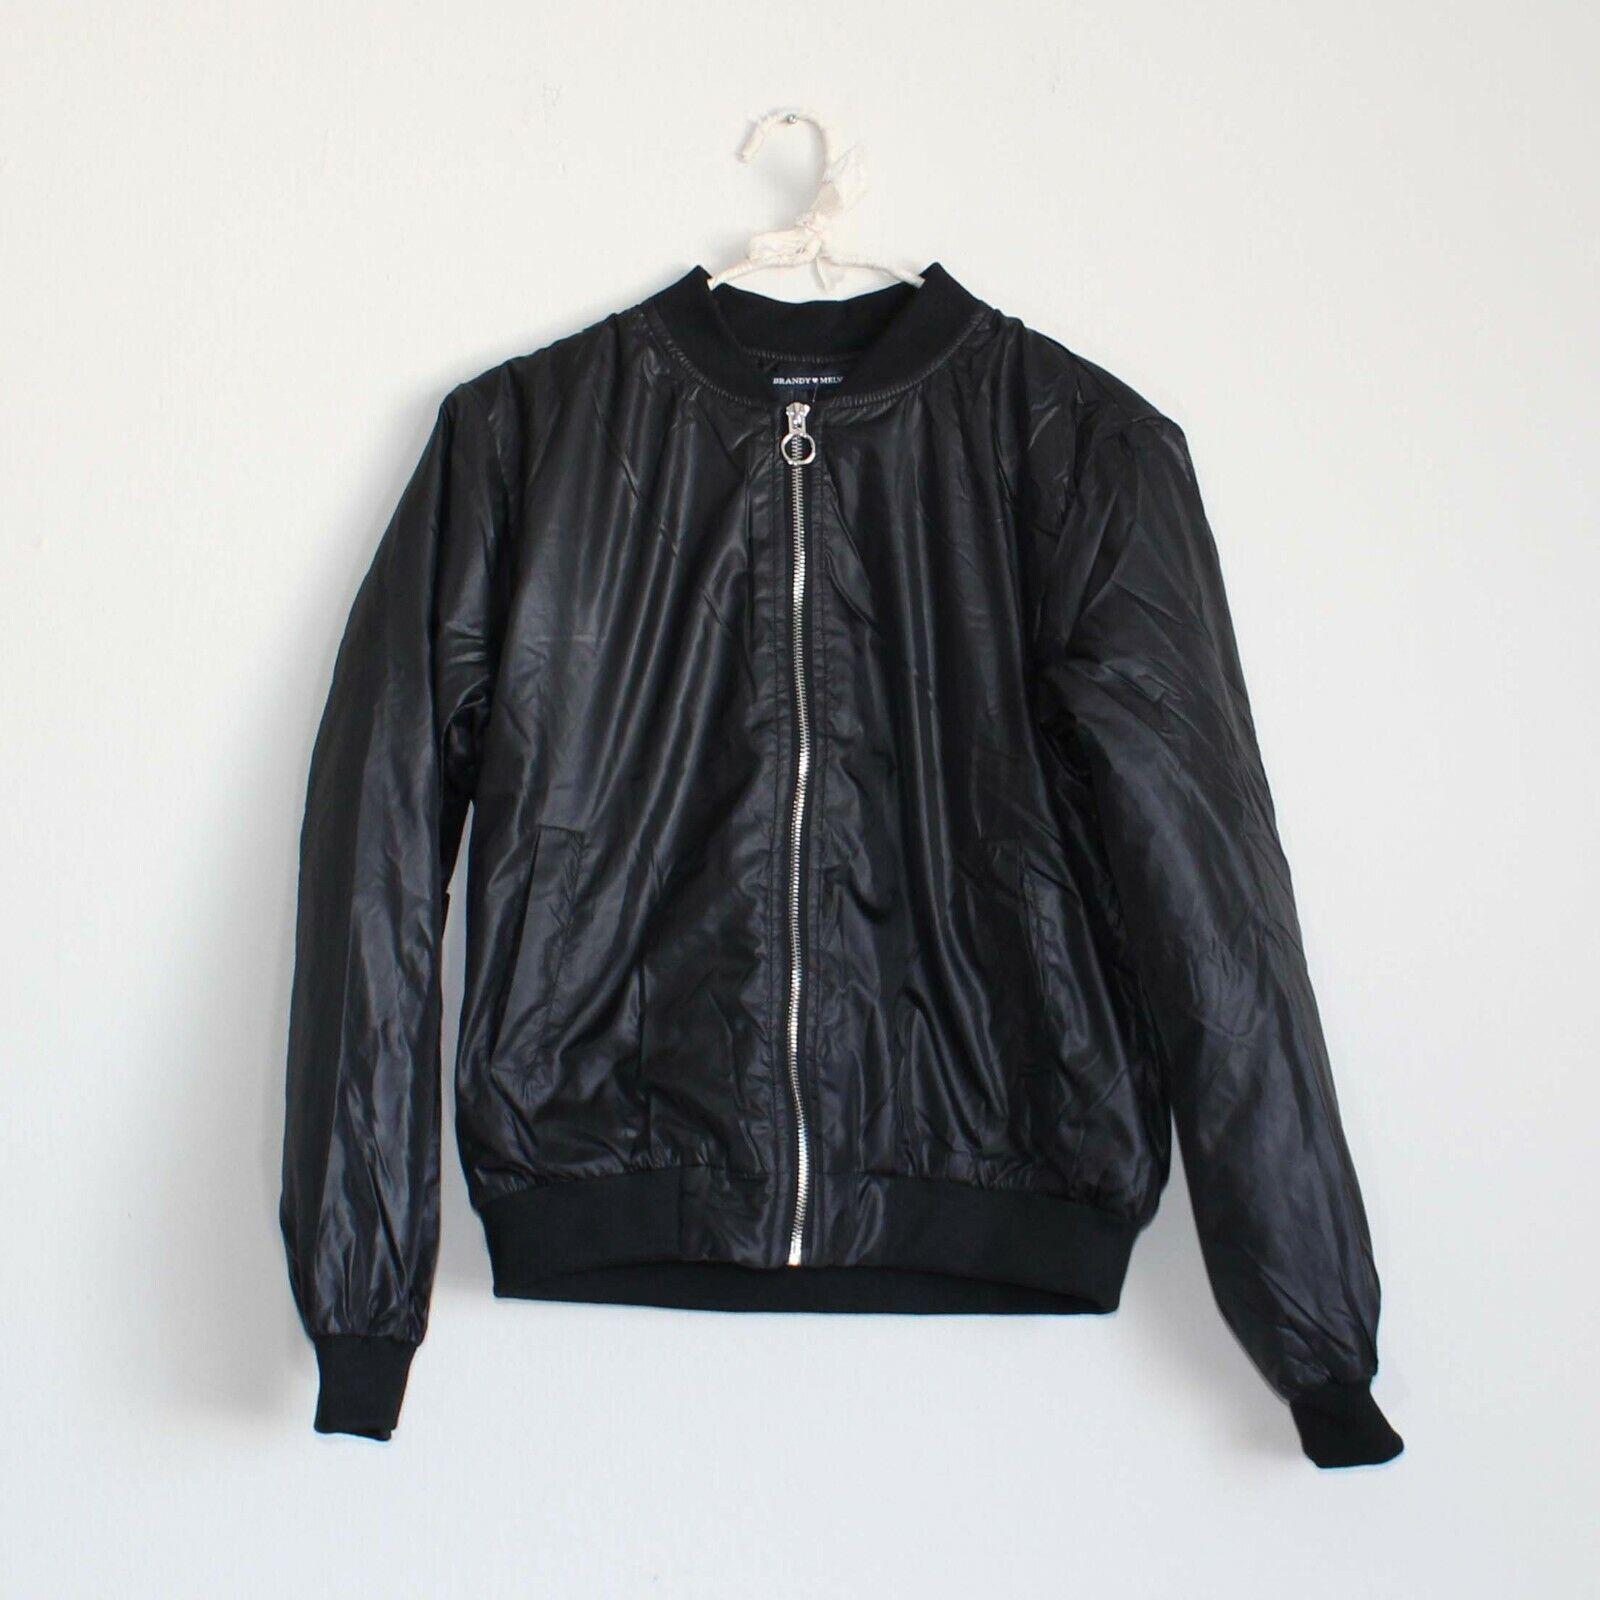 Brandy Melville Bomber Jacket Black XS Shiny Semi Cropped